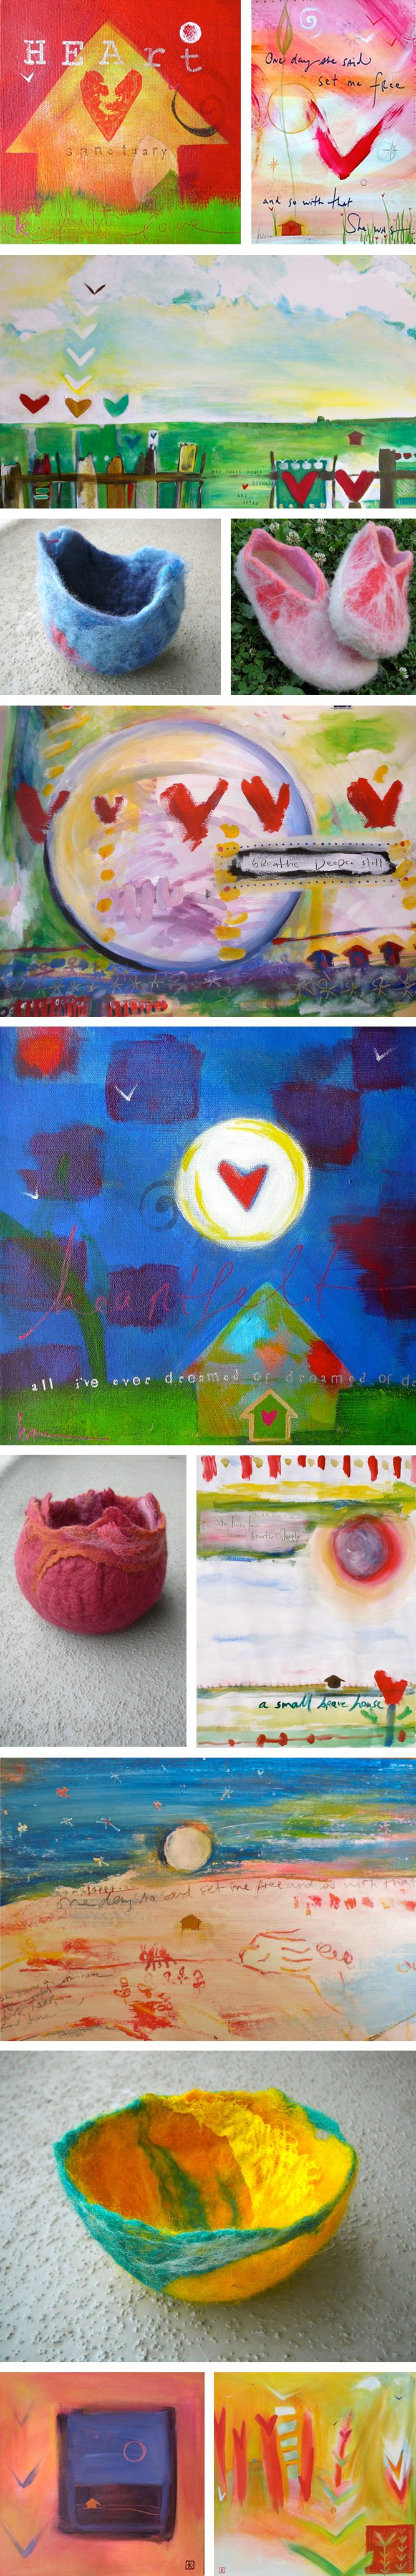 KristinBoettger.com Handmade Collage